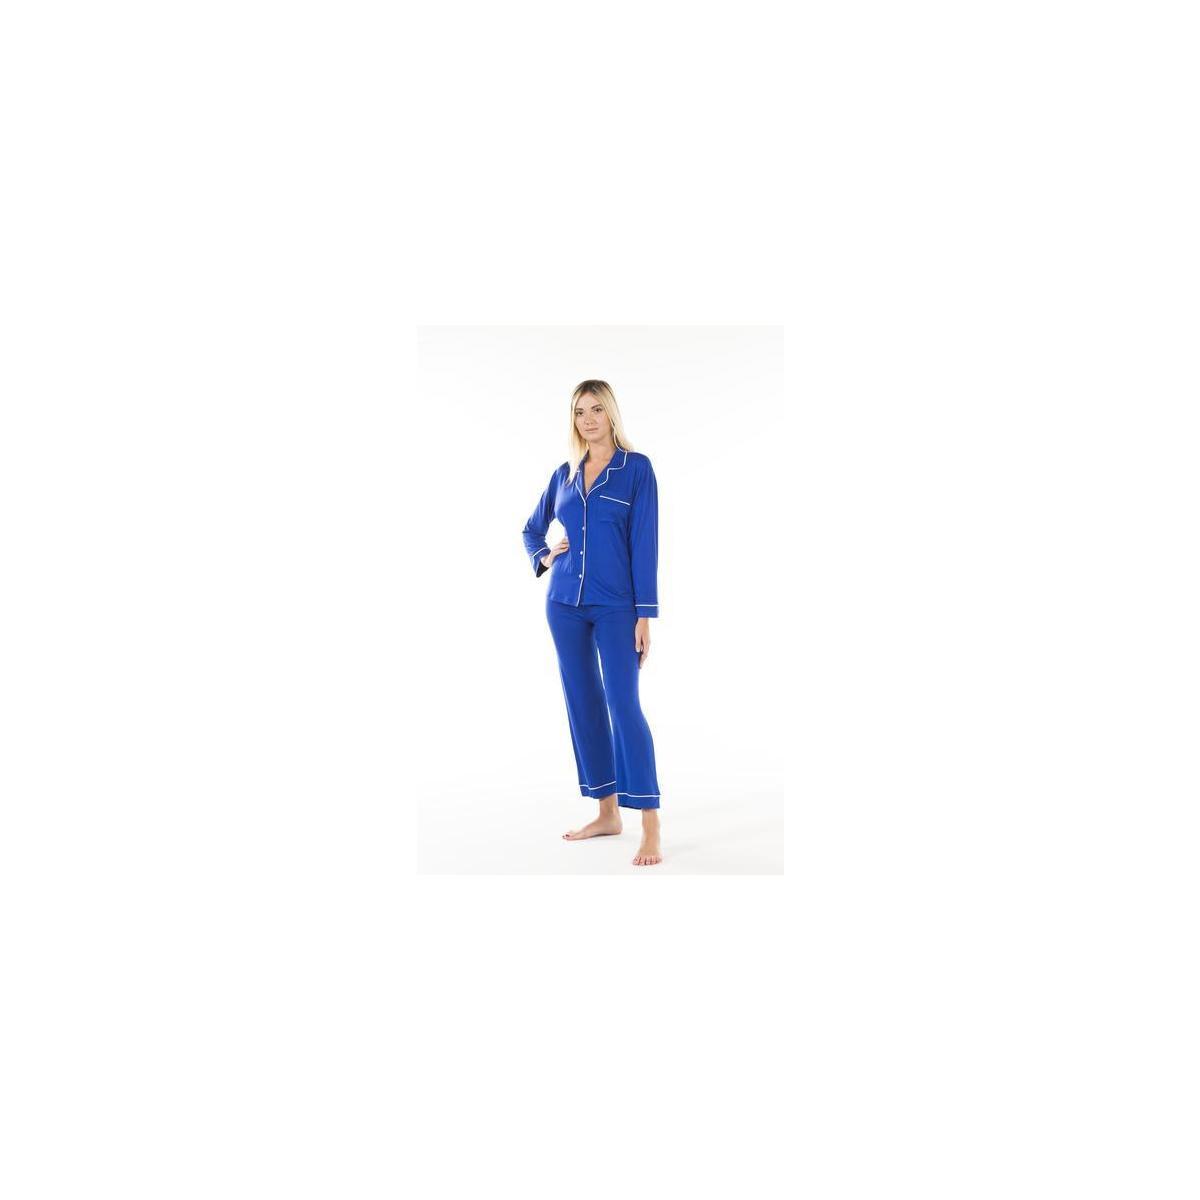 Women's Pajamas Set (All Colors: Black, Heather, Navy, Dark Red, Blue, Purple, Green)